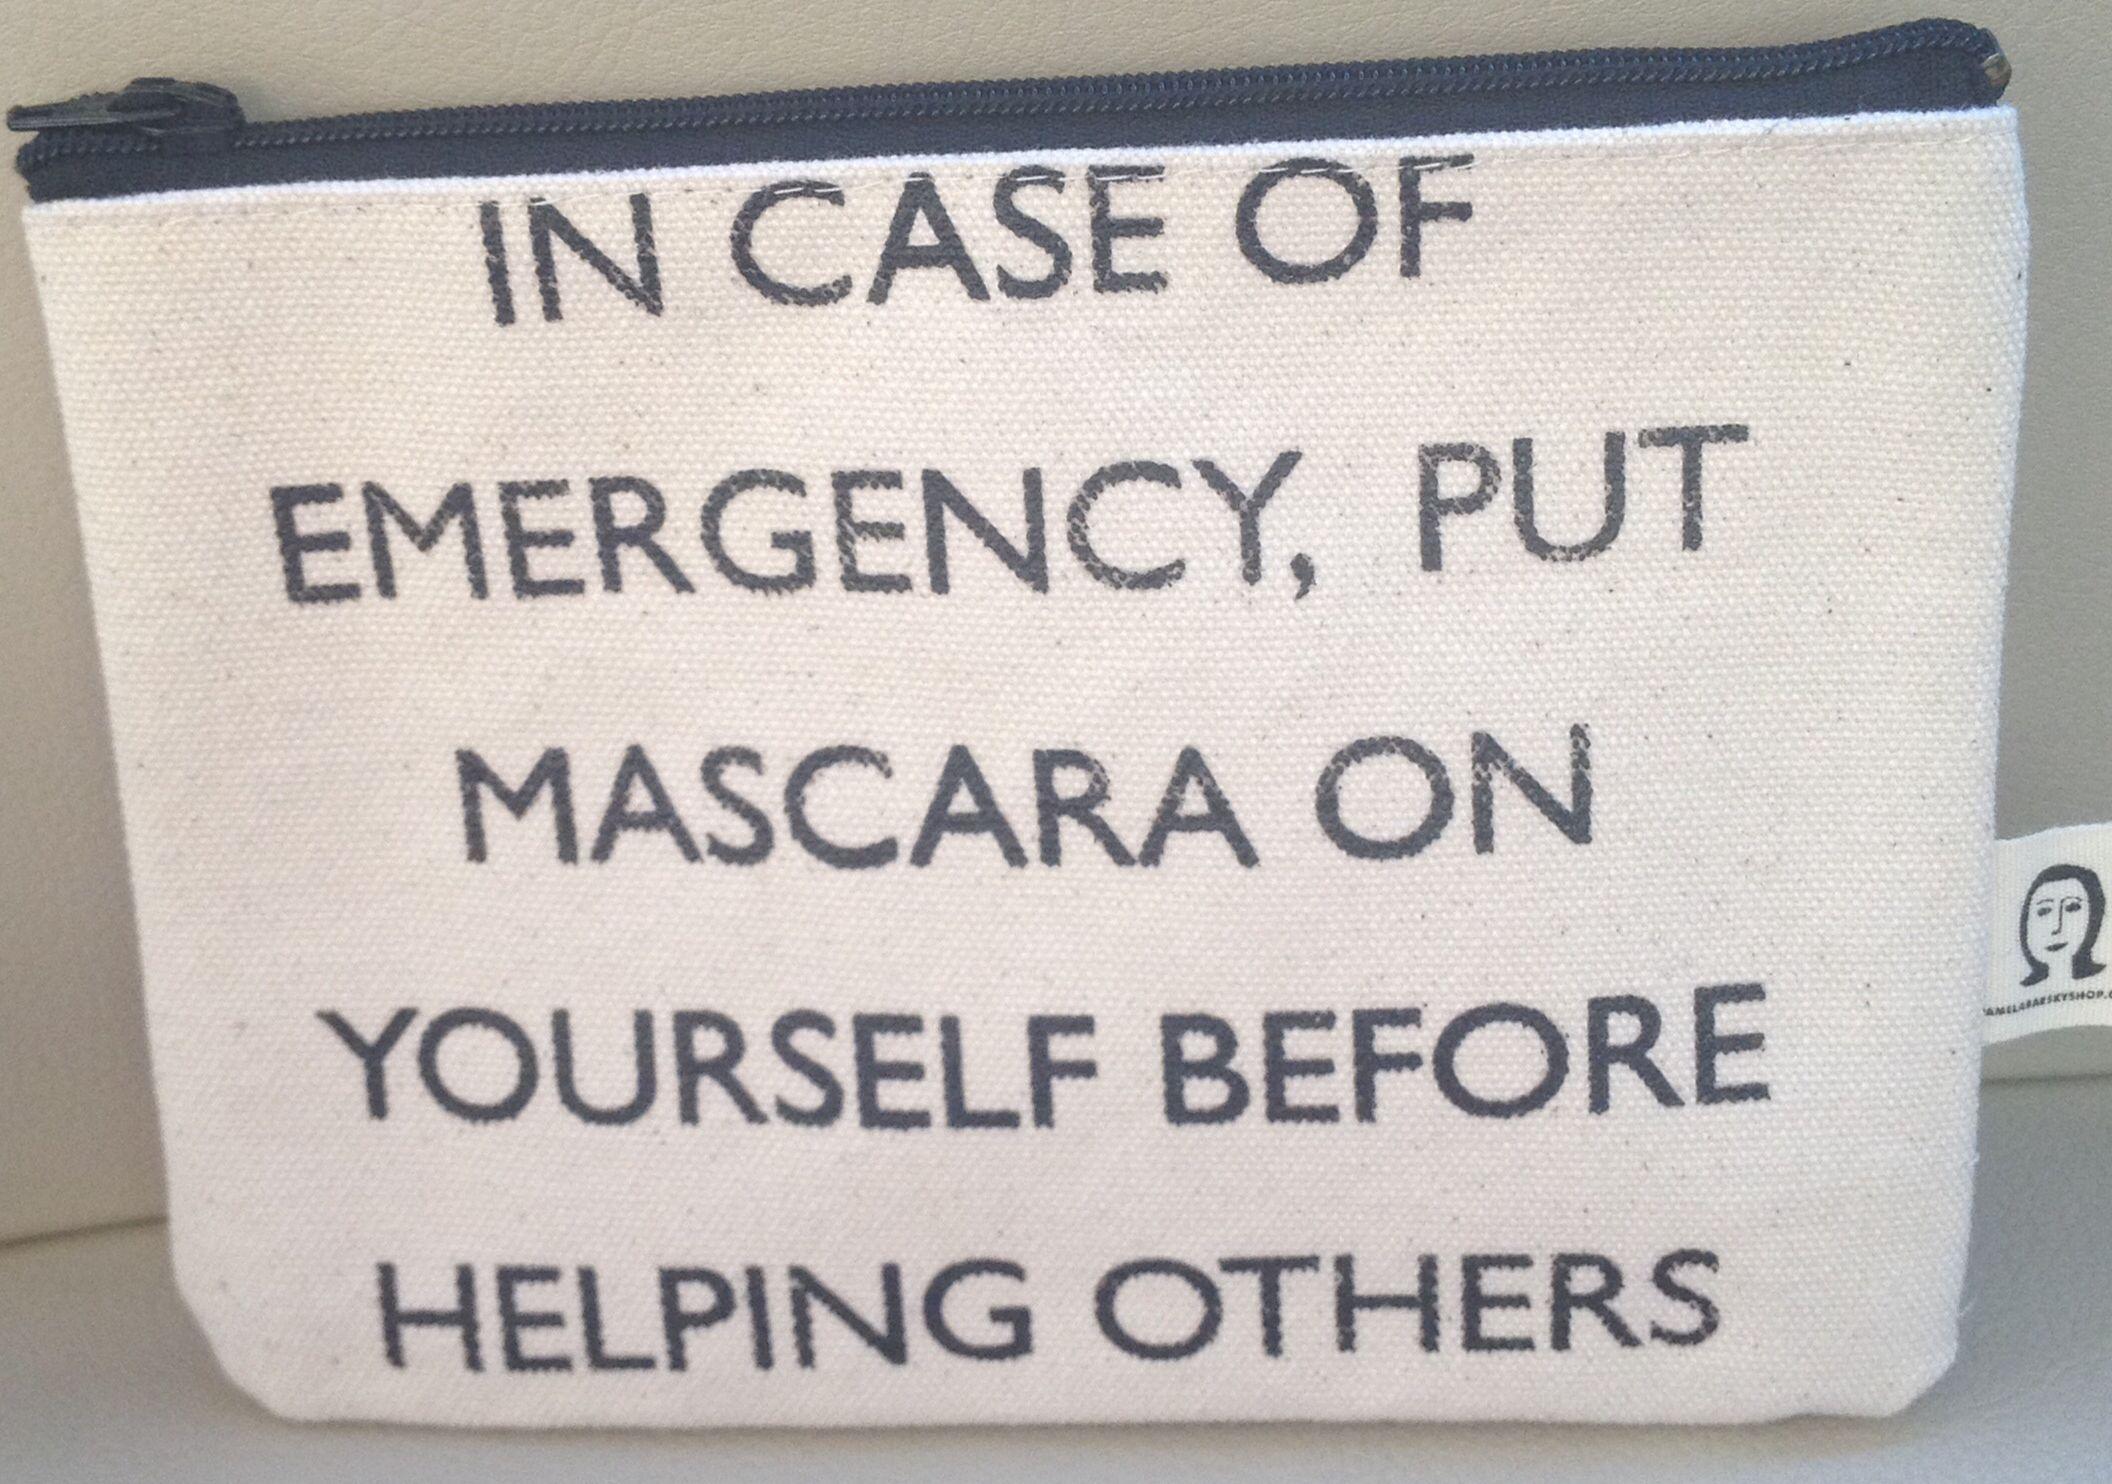 #makeup #makeuphumor #mascara #travel #emergency #plane #airplane #travelbag #carryon  #cosmetics